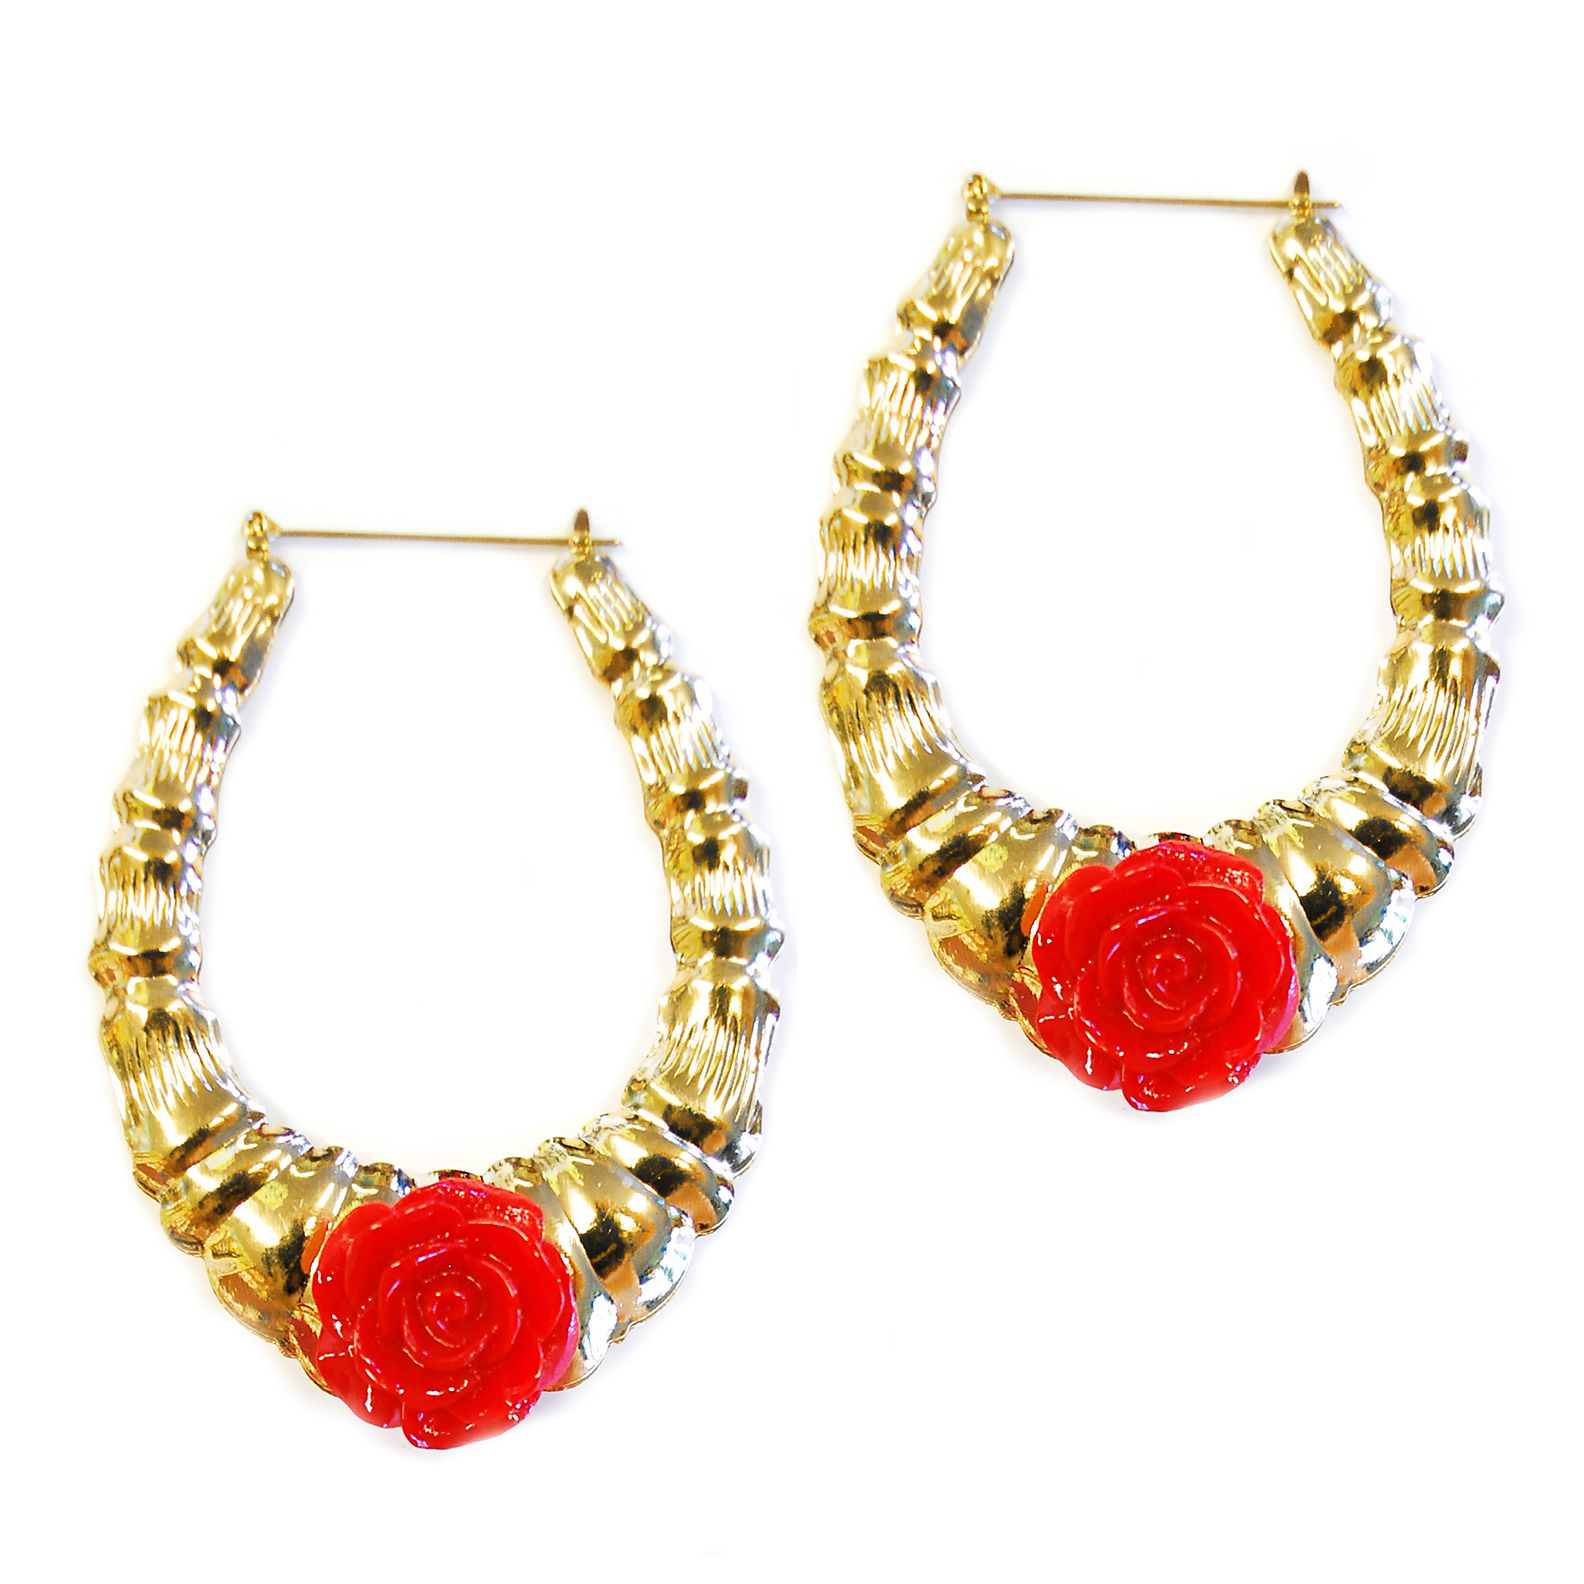 Ilaments Gold Bamboo Rose Earrings #bamboo #earrings #rose #